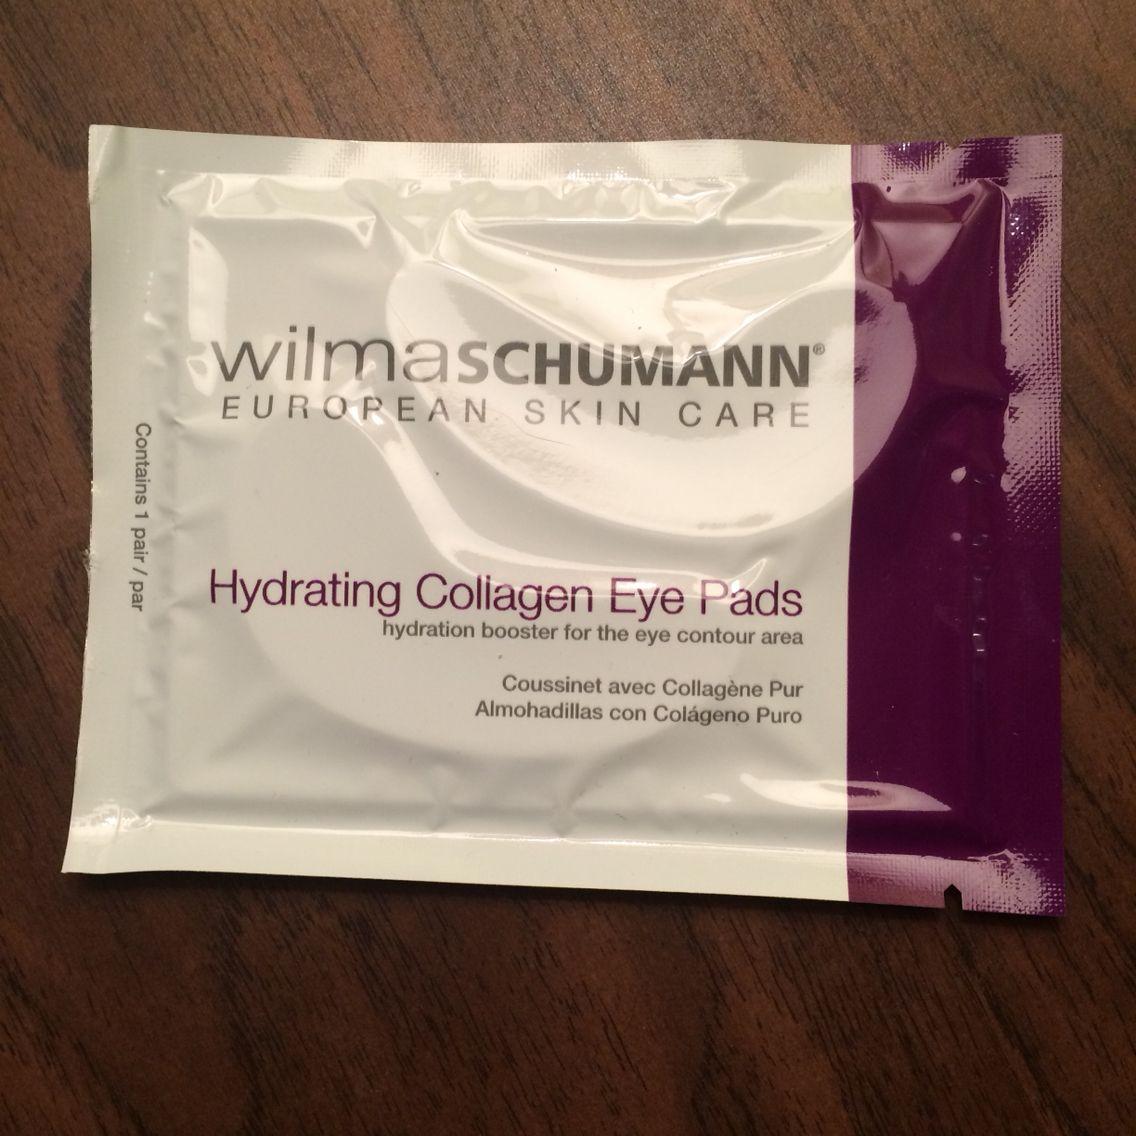 Deb Wilma Schumann Hydrating Collagen Eye Pads 2 Memebox Eye Contour Birchbox